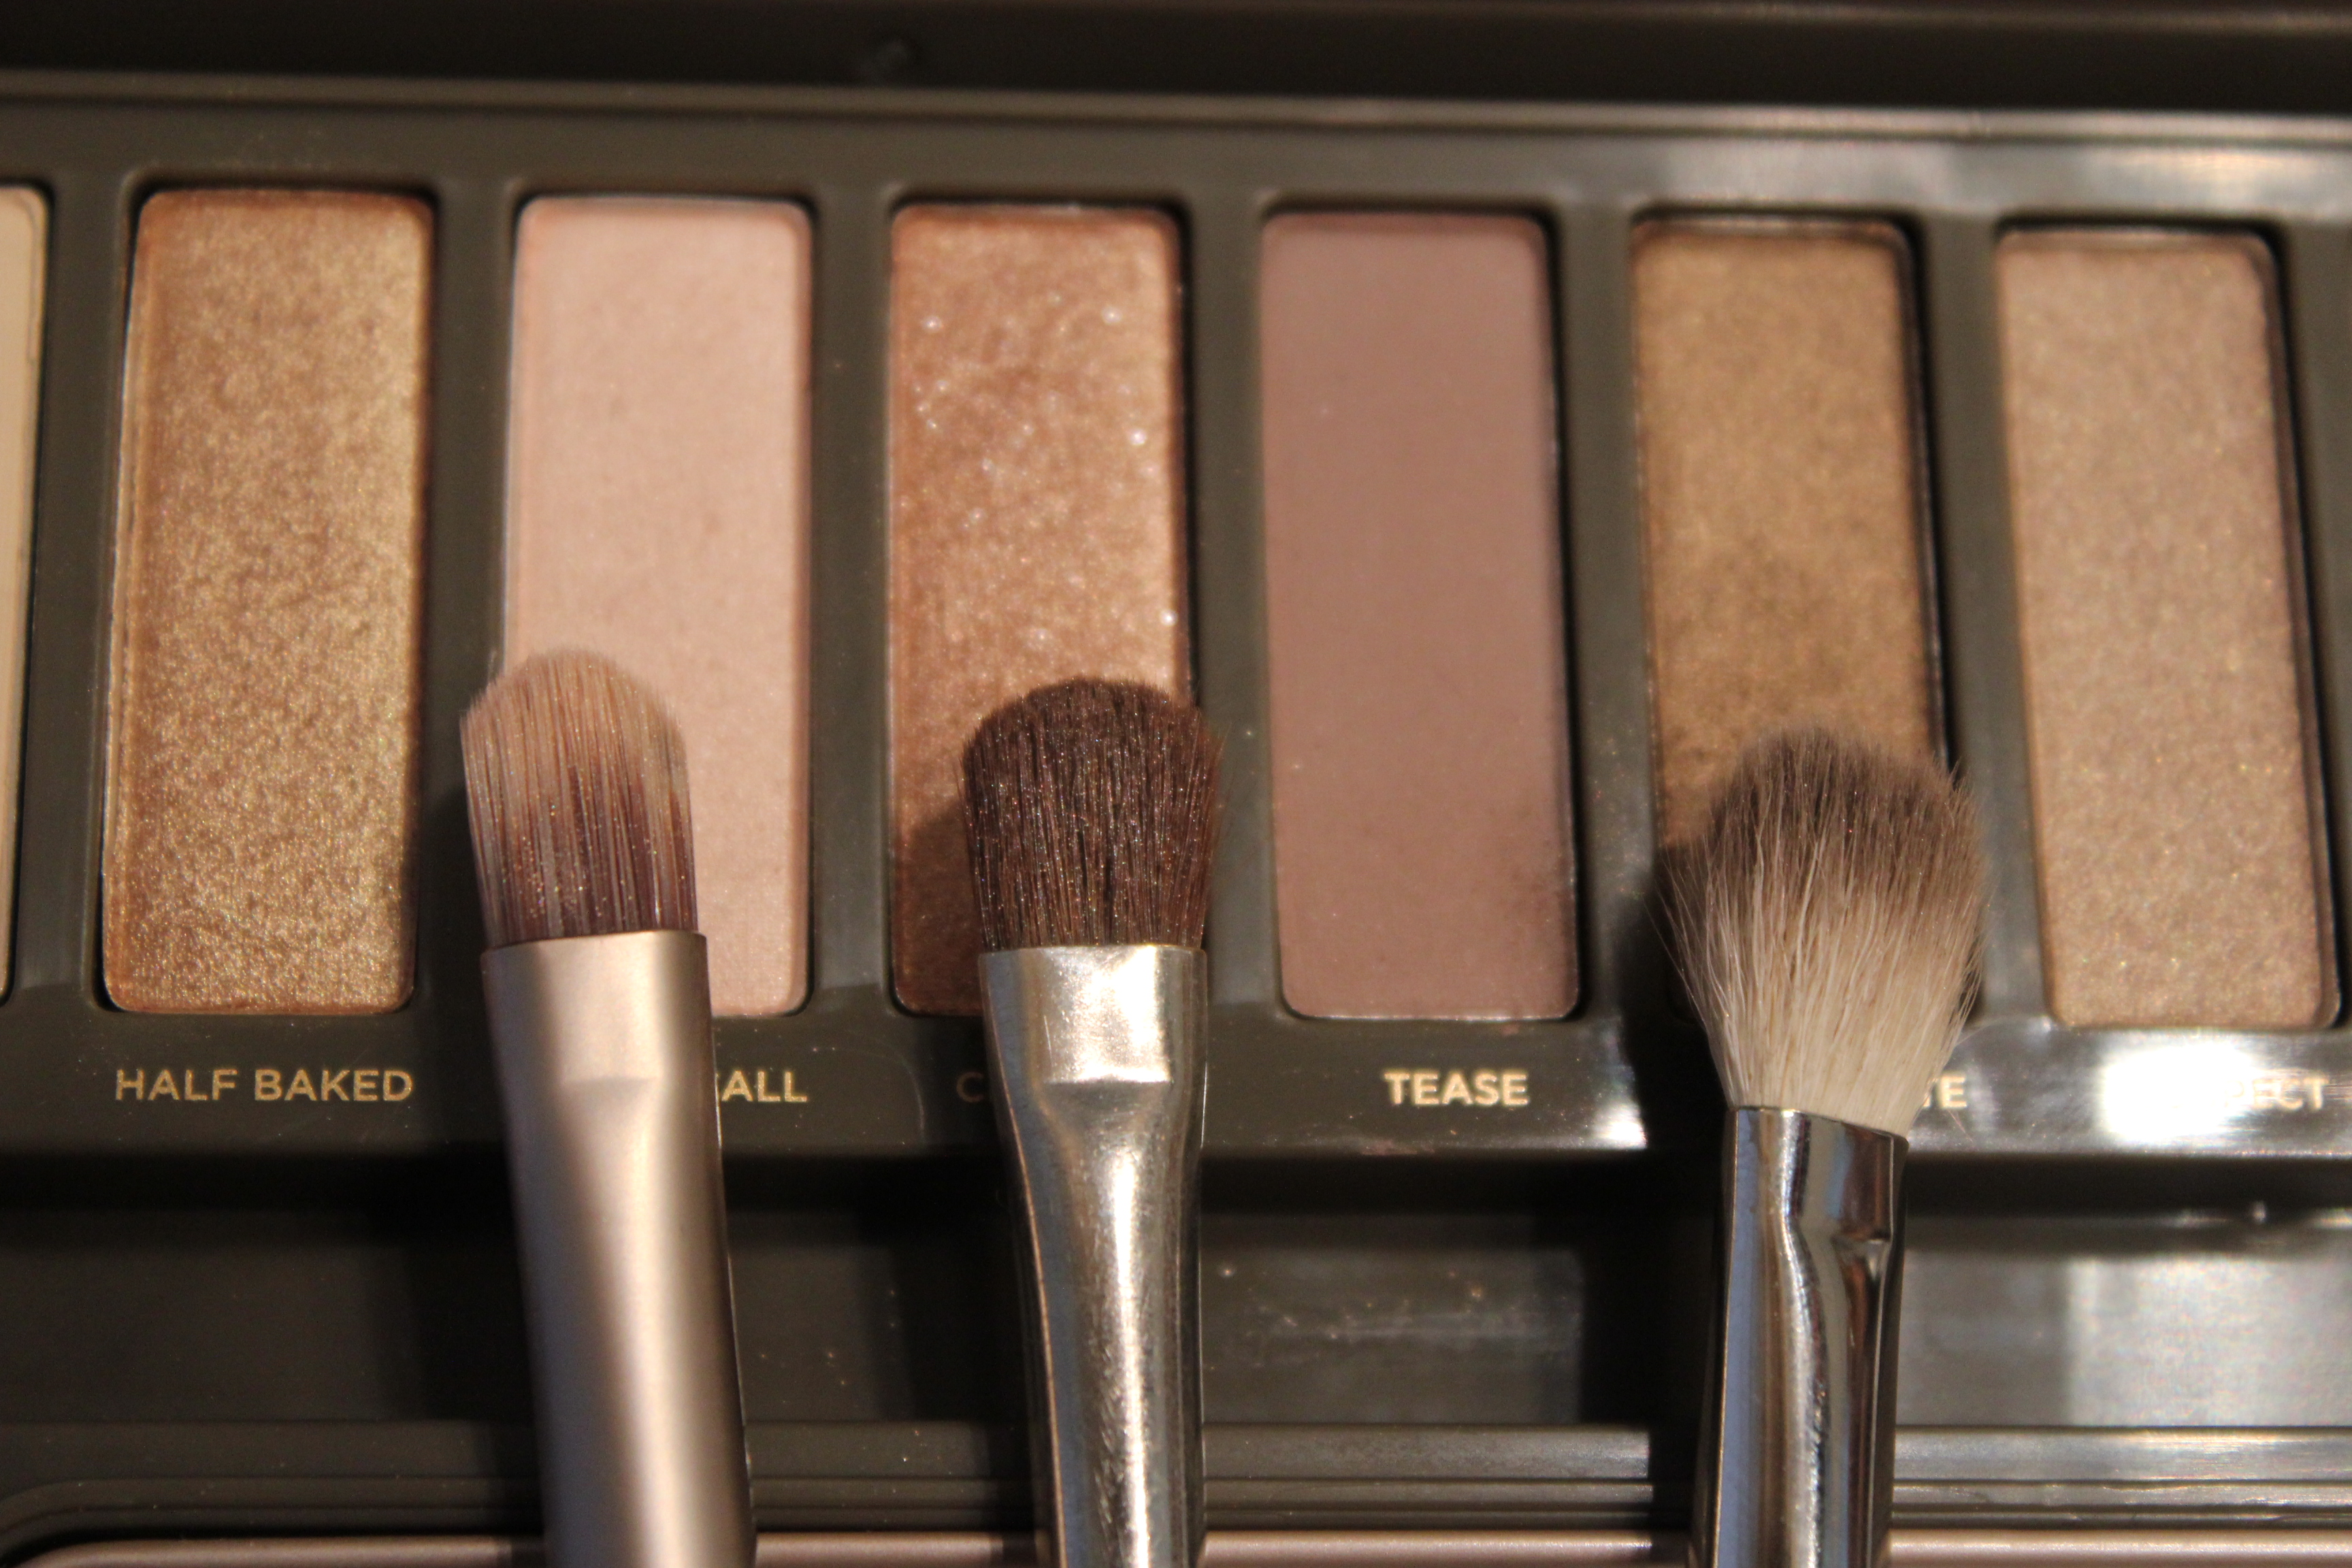 maquillage avec la palette naked 2 une parenth se mode. Black Bedroom Furniture Sets. Home Design Ideas